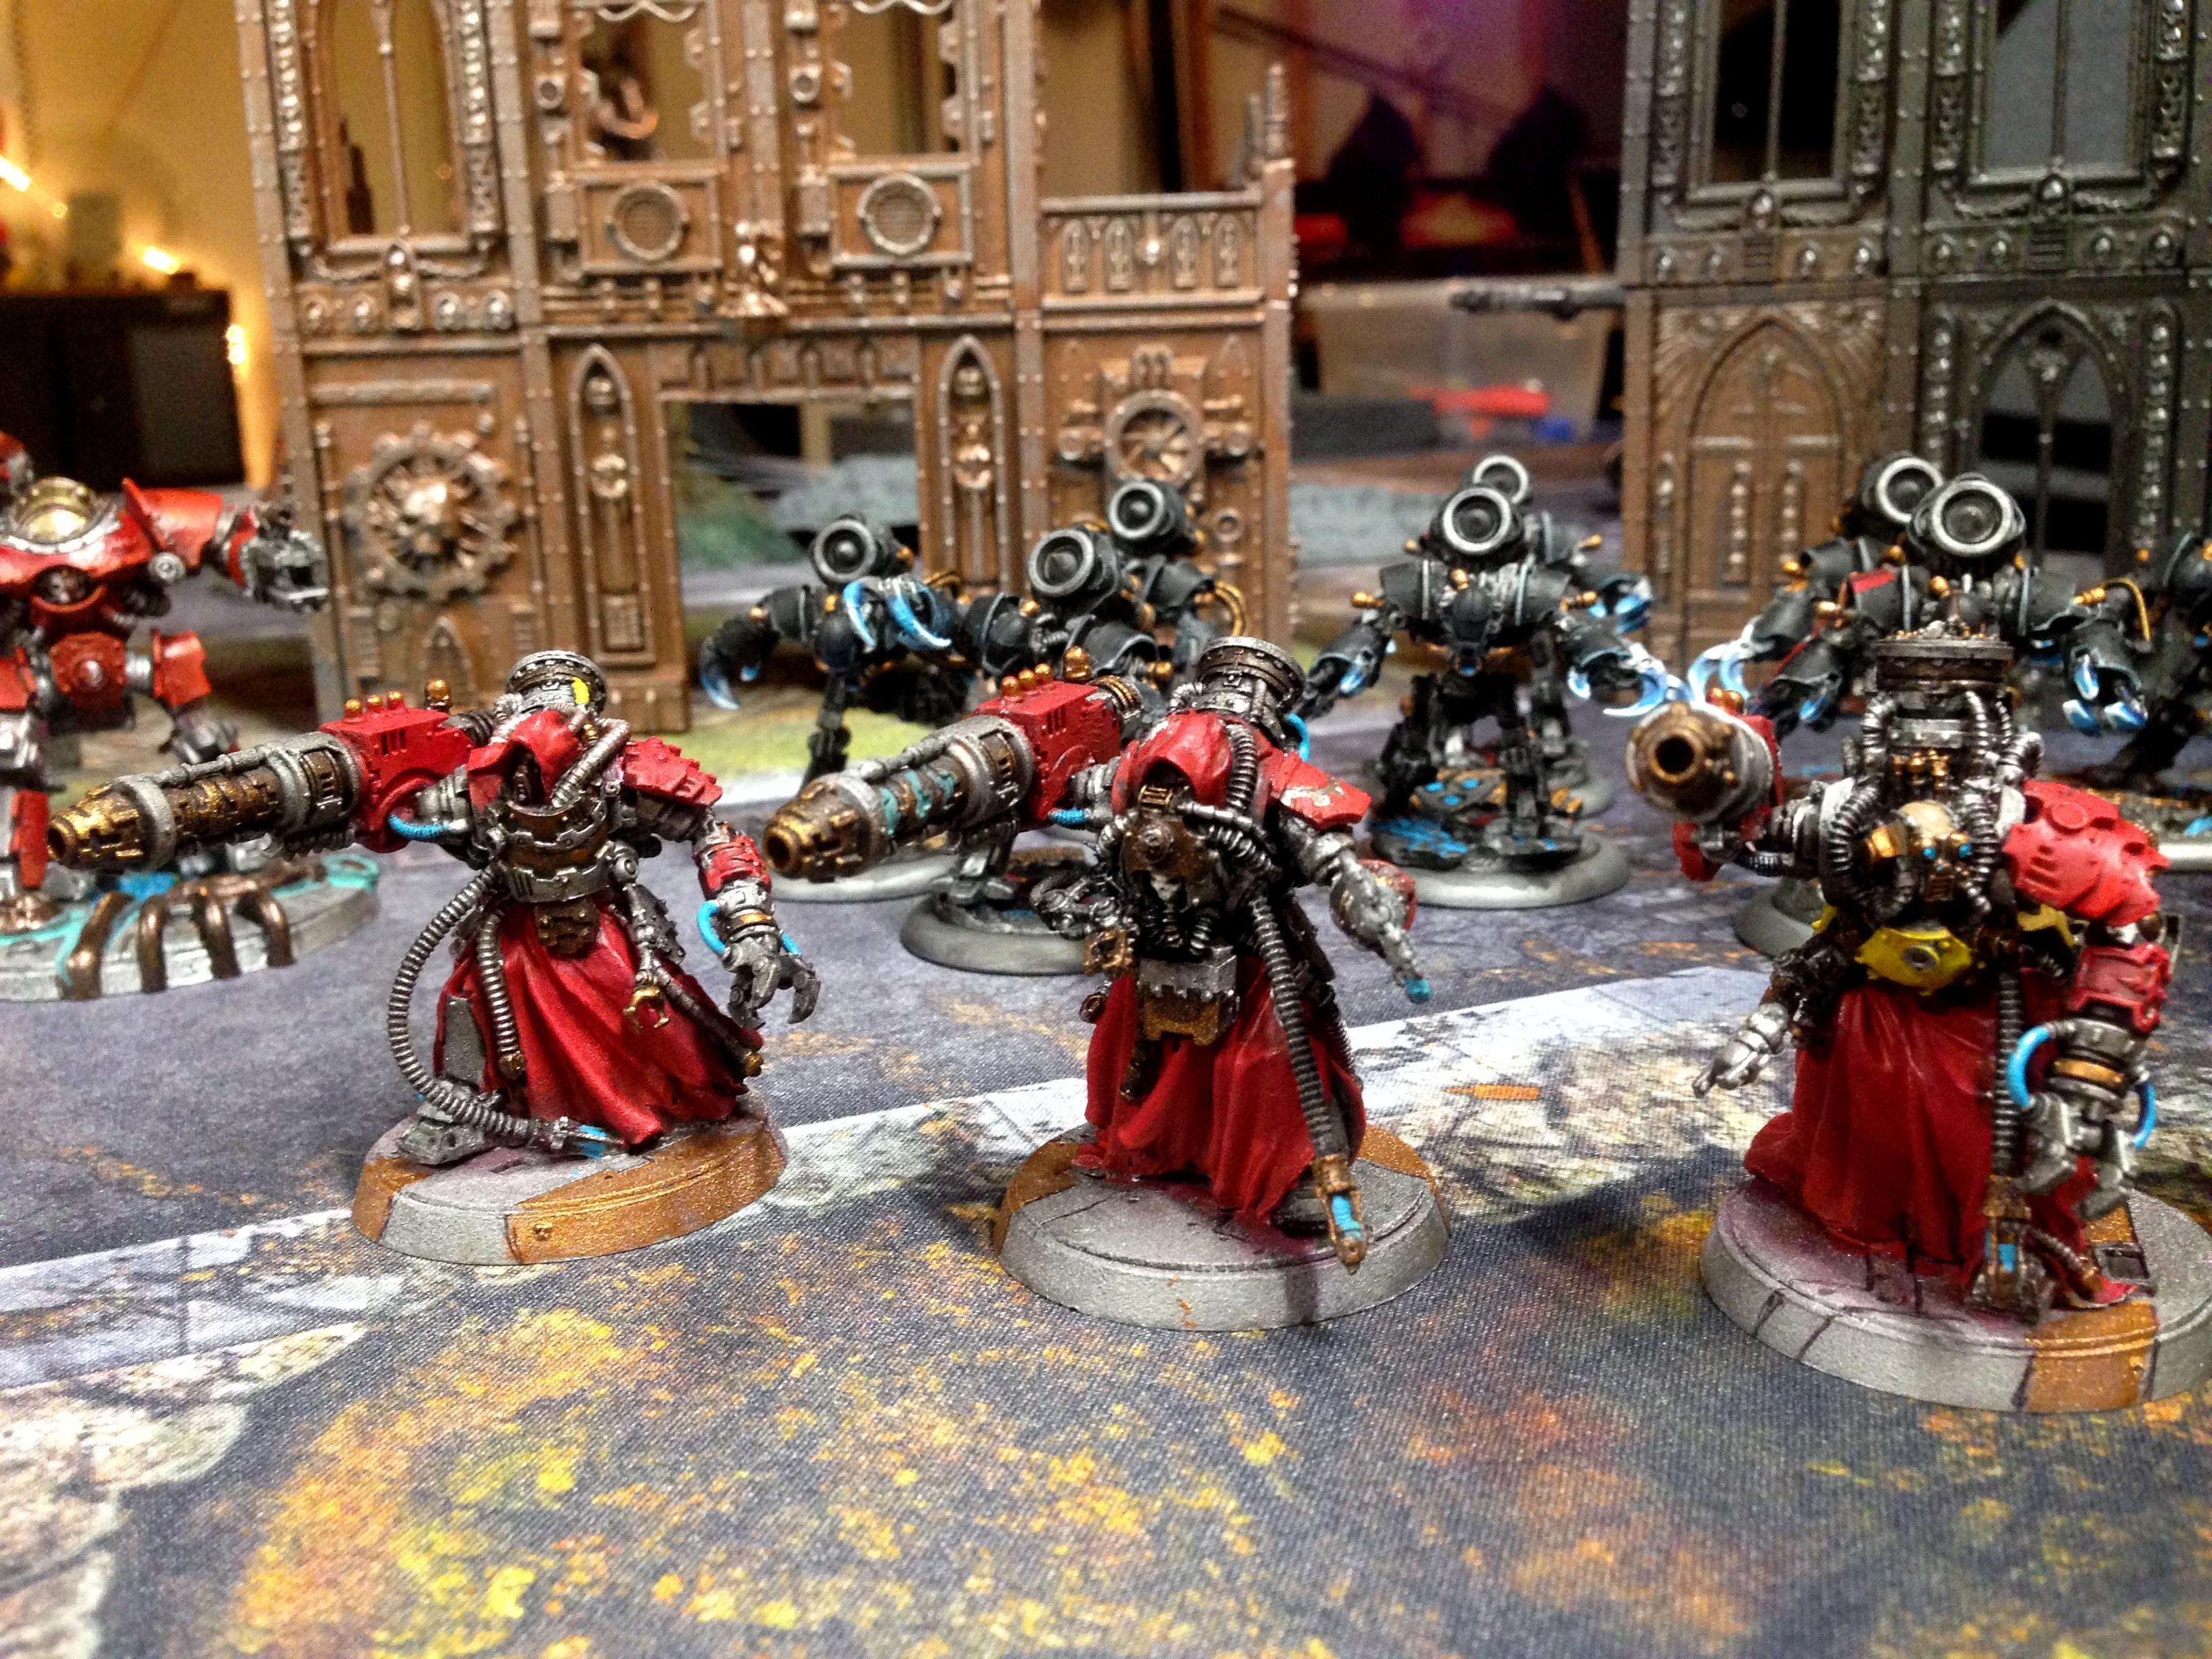 30k, Heresy, Infantry, Mechanicum, Myrmidons, Ordo Reductor